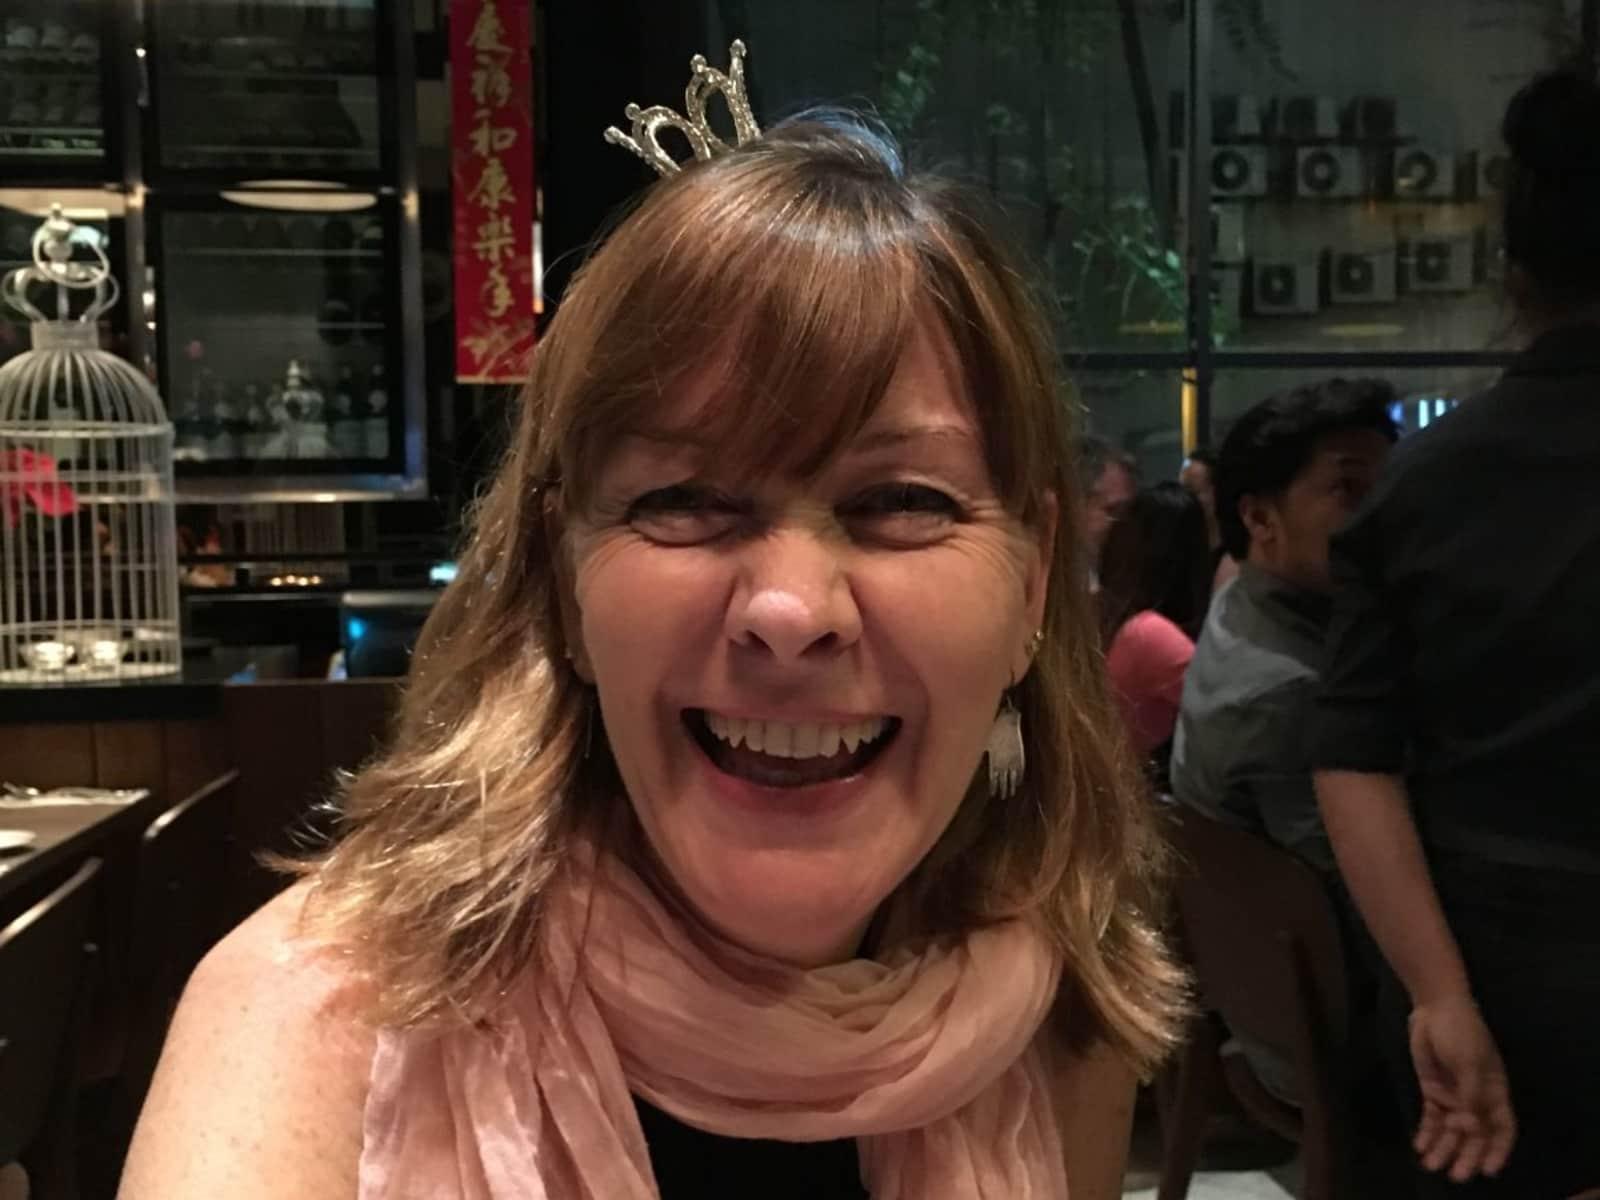 Cheri from Kuala Lumpur, Malaysia